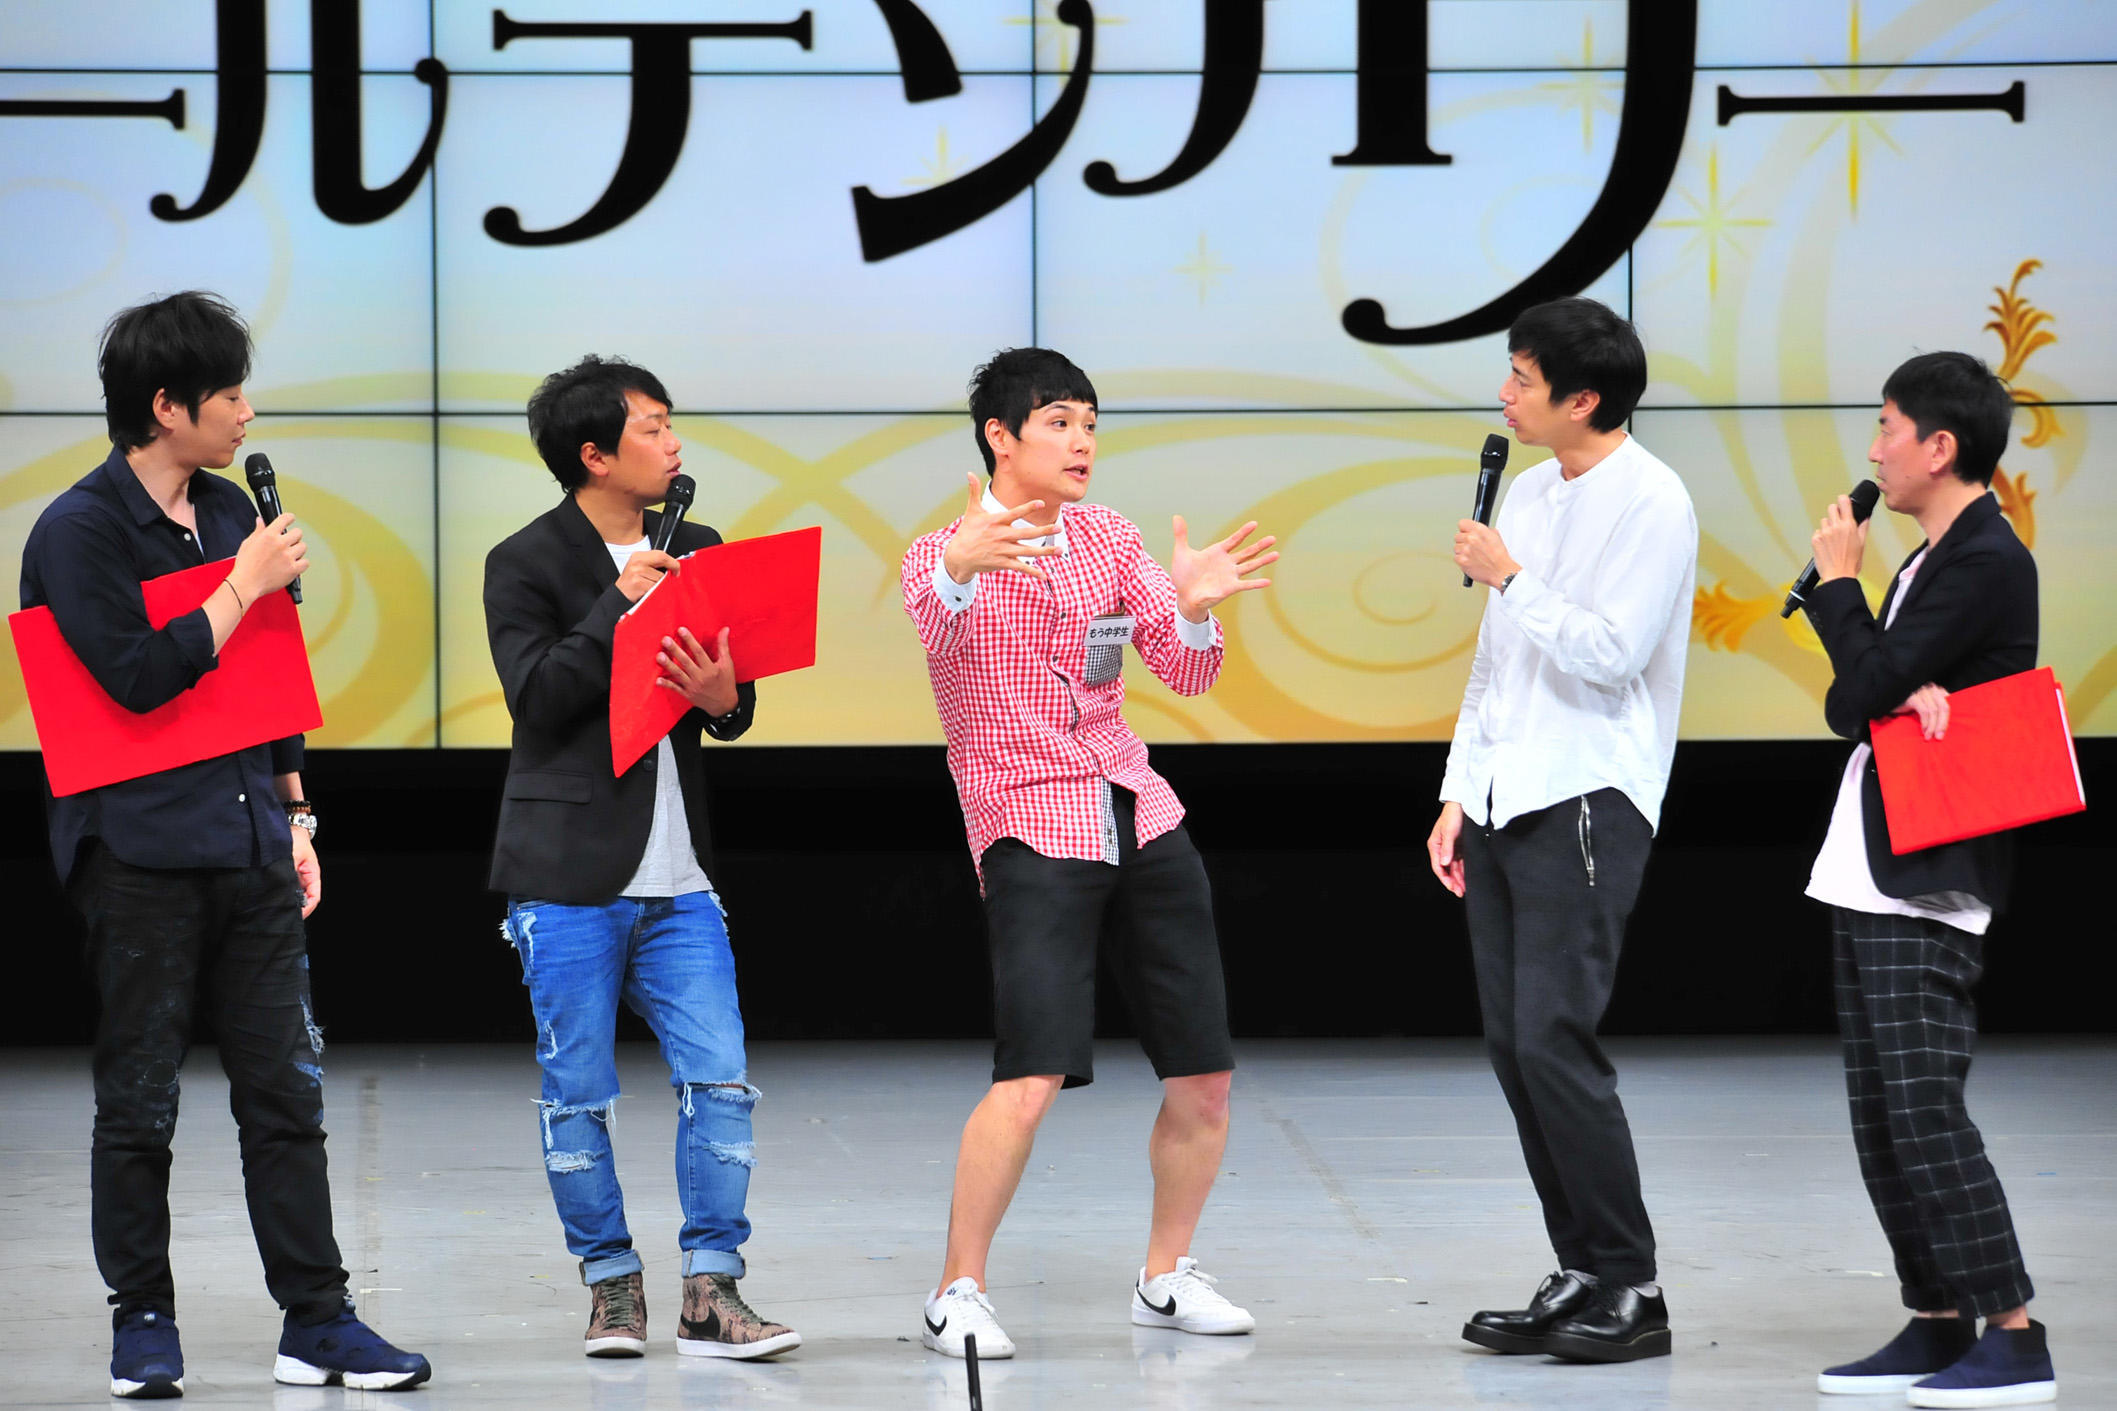 http://news.yoshimoto.co.jp/20160429204650-7702579b595fa48da9cf6f476491a2821834b16d.jpg